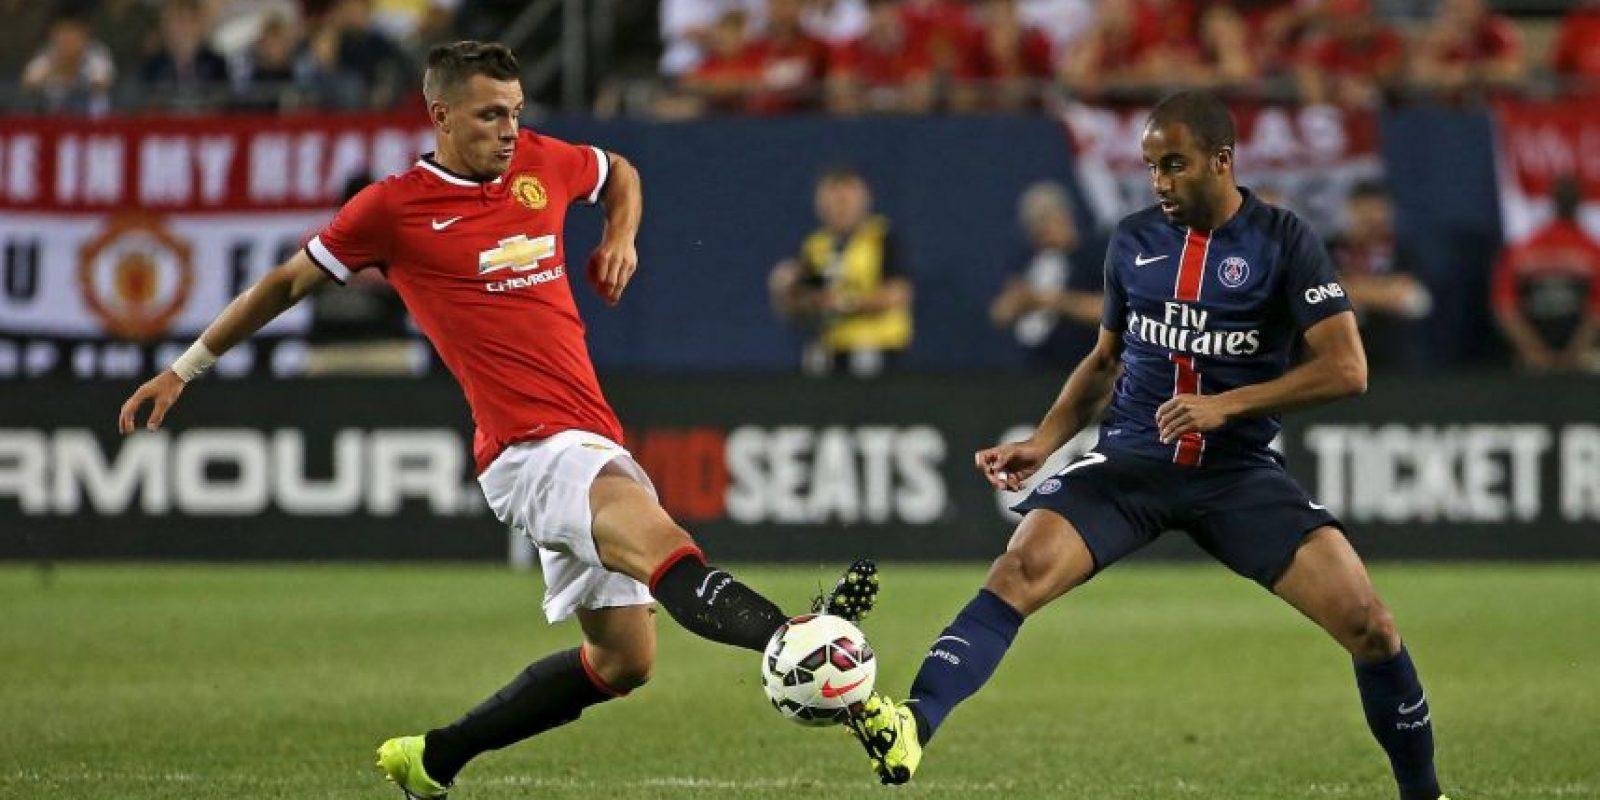 Manchester United tuvo que pagar 35 millones de euros al Southampton para obtener al mediocampista francés Foto:Getty Images